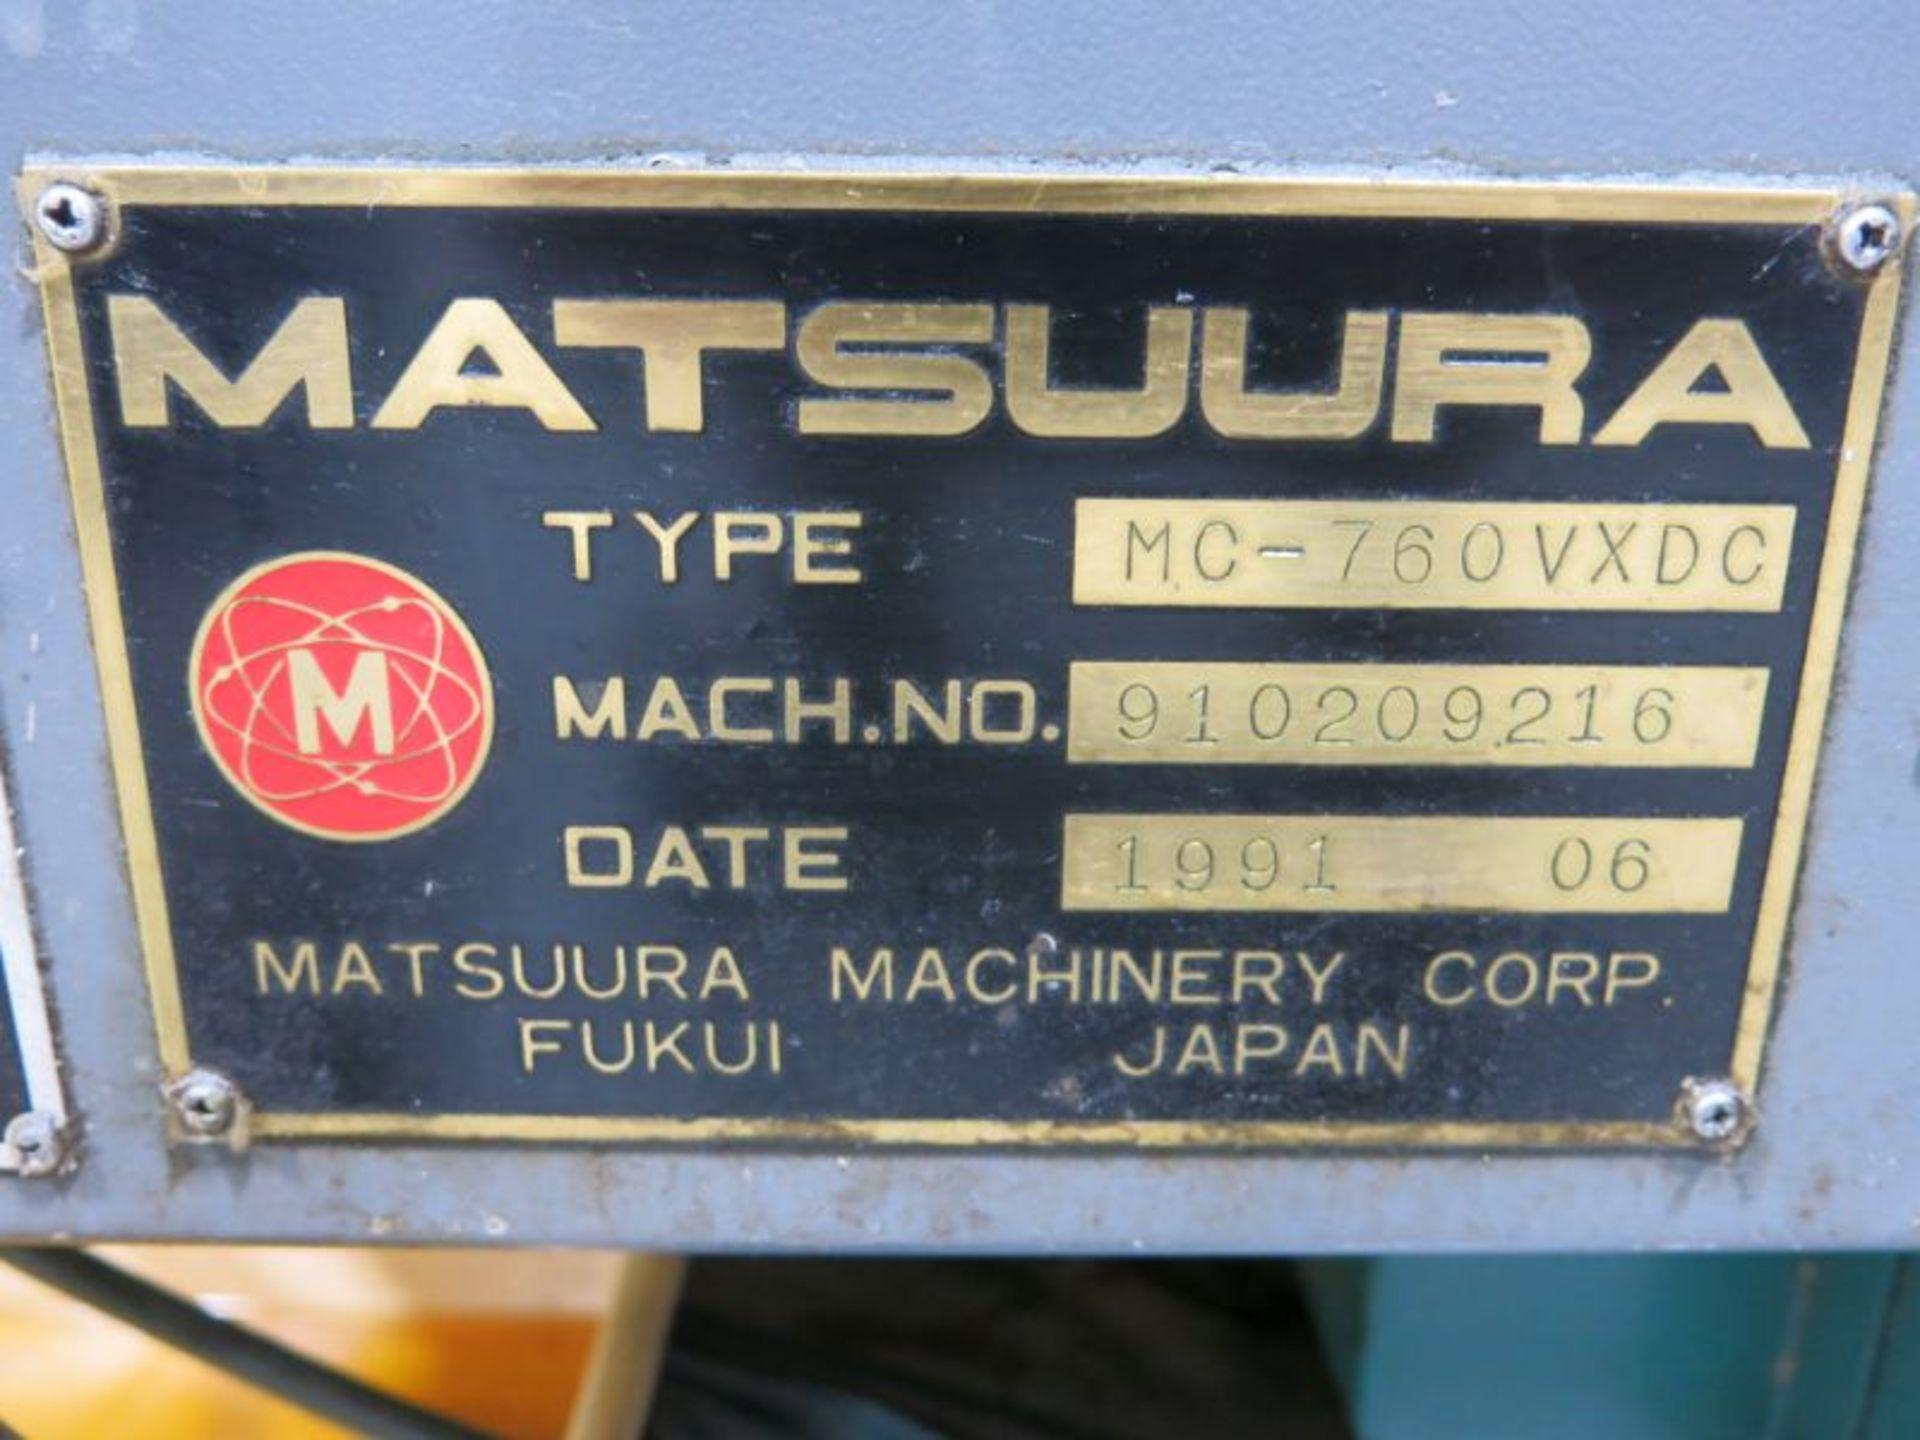 1991 Matsuura MC-760VX-DC Twin Spindle CNC VMC - Image 5 of 5